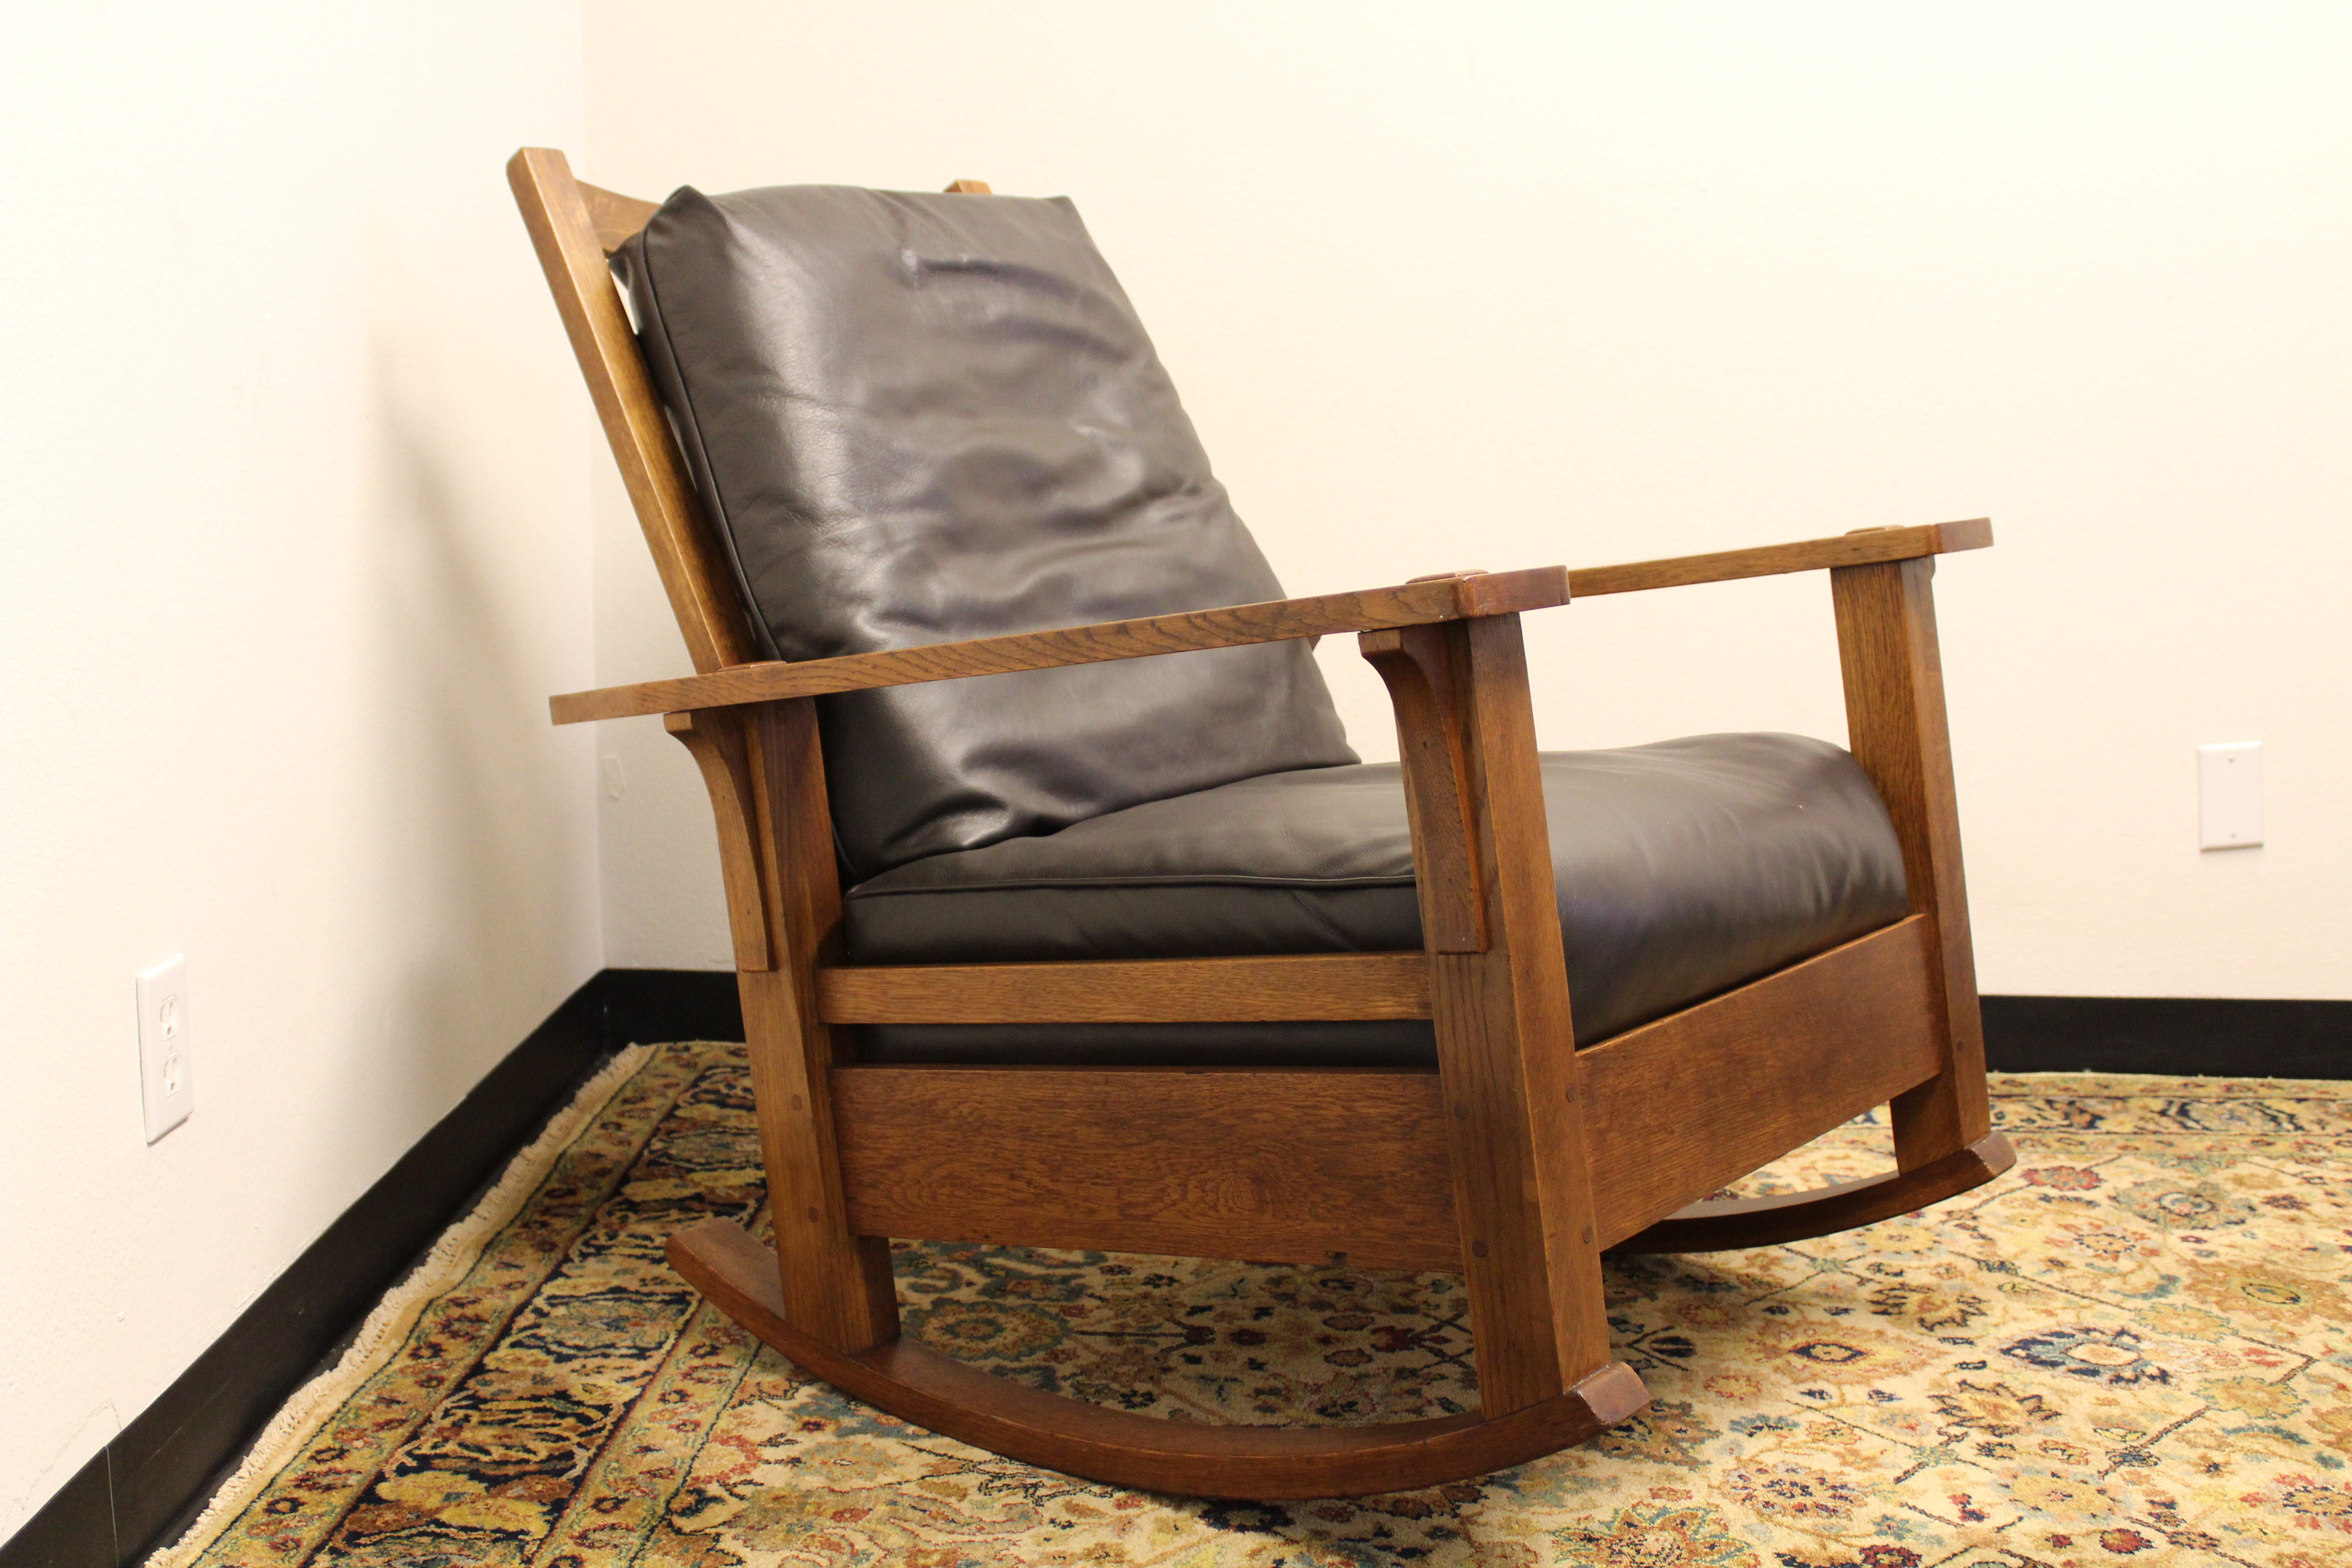 Phenomenal Ljg Stickley Rocker Creativecarmelina Interior Chair Design Creativecarmelinacom